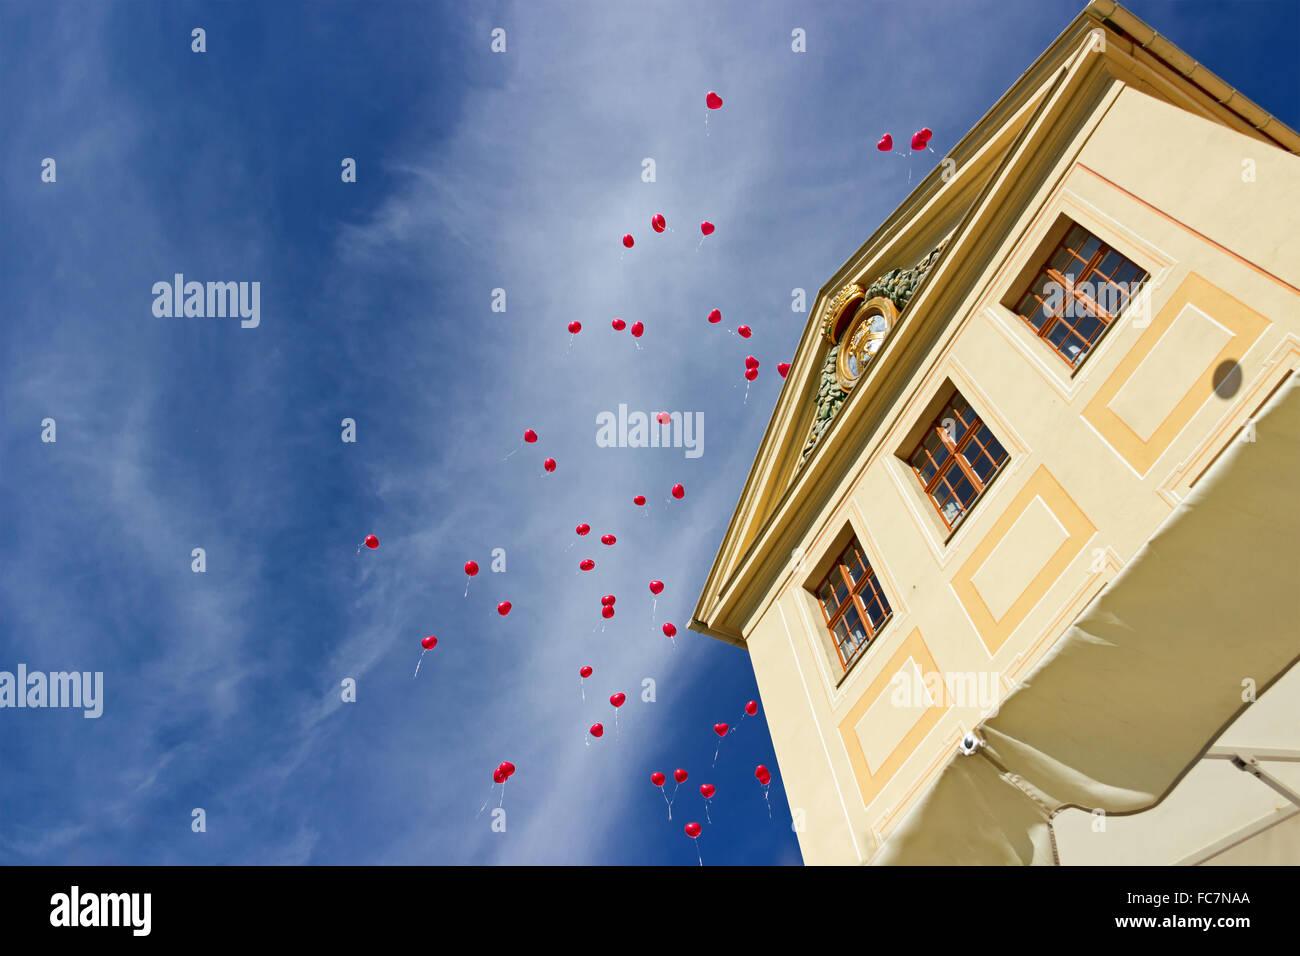 Baloon - Stock Image